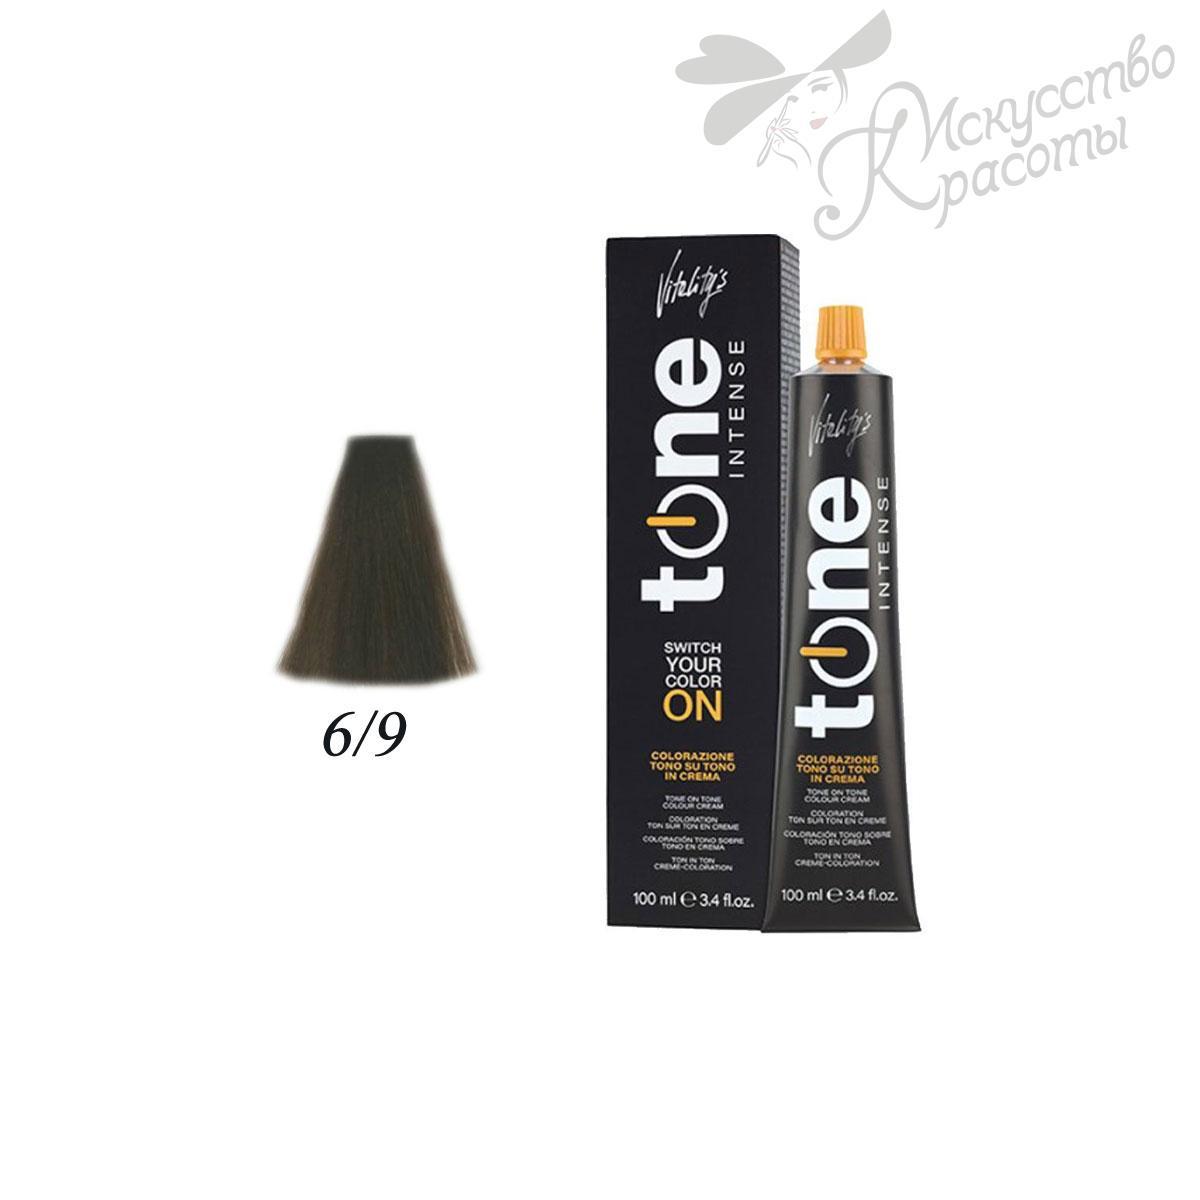 Краска для волос 6/9 коричневый темный блонд Tone Intense Vitality's 100мл